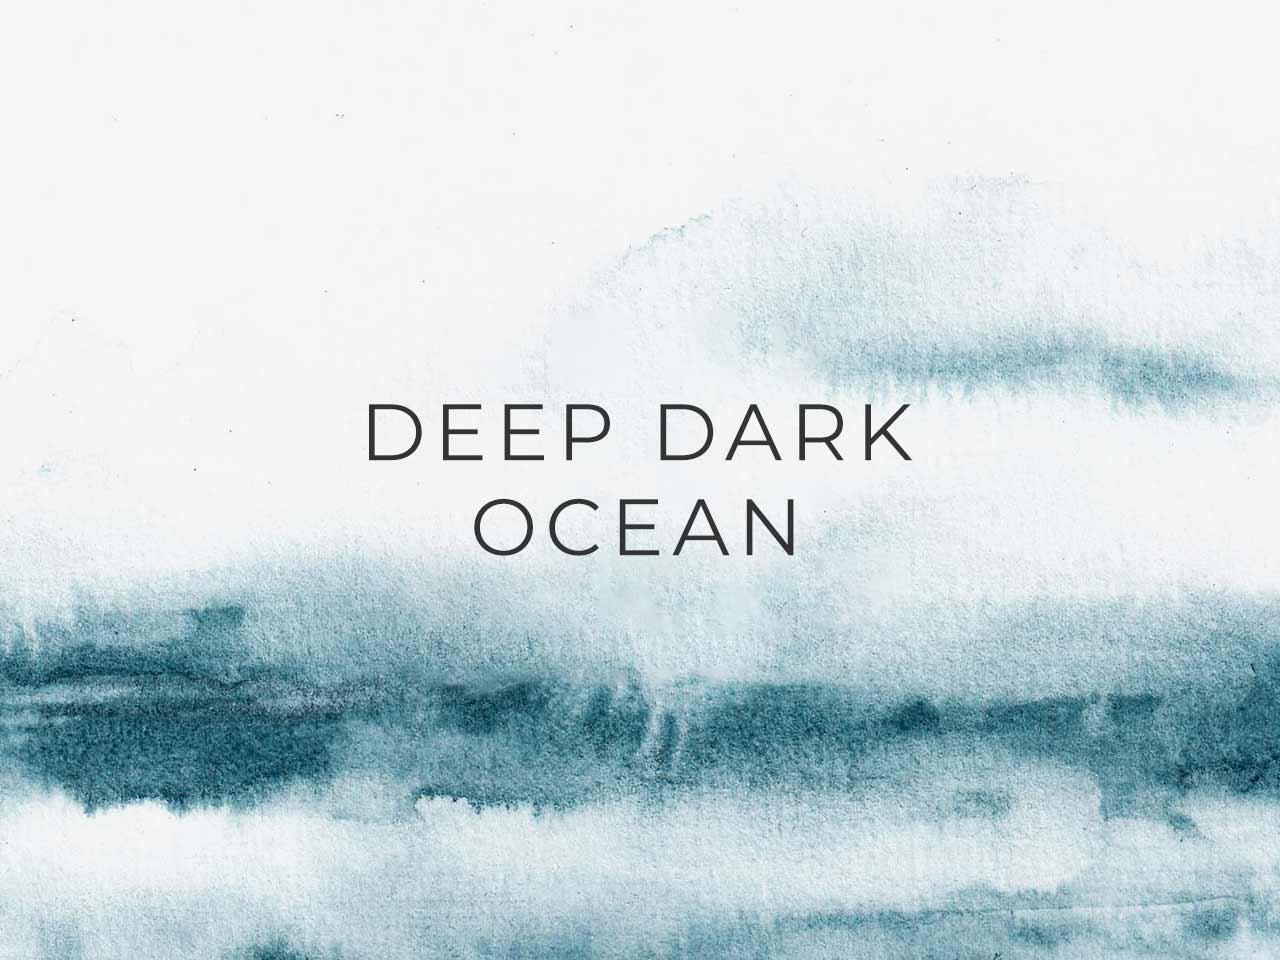 Free Deep Dark Ocean Abstract Watercolor